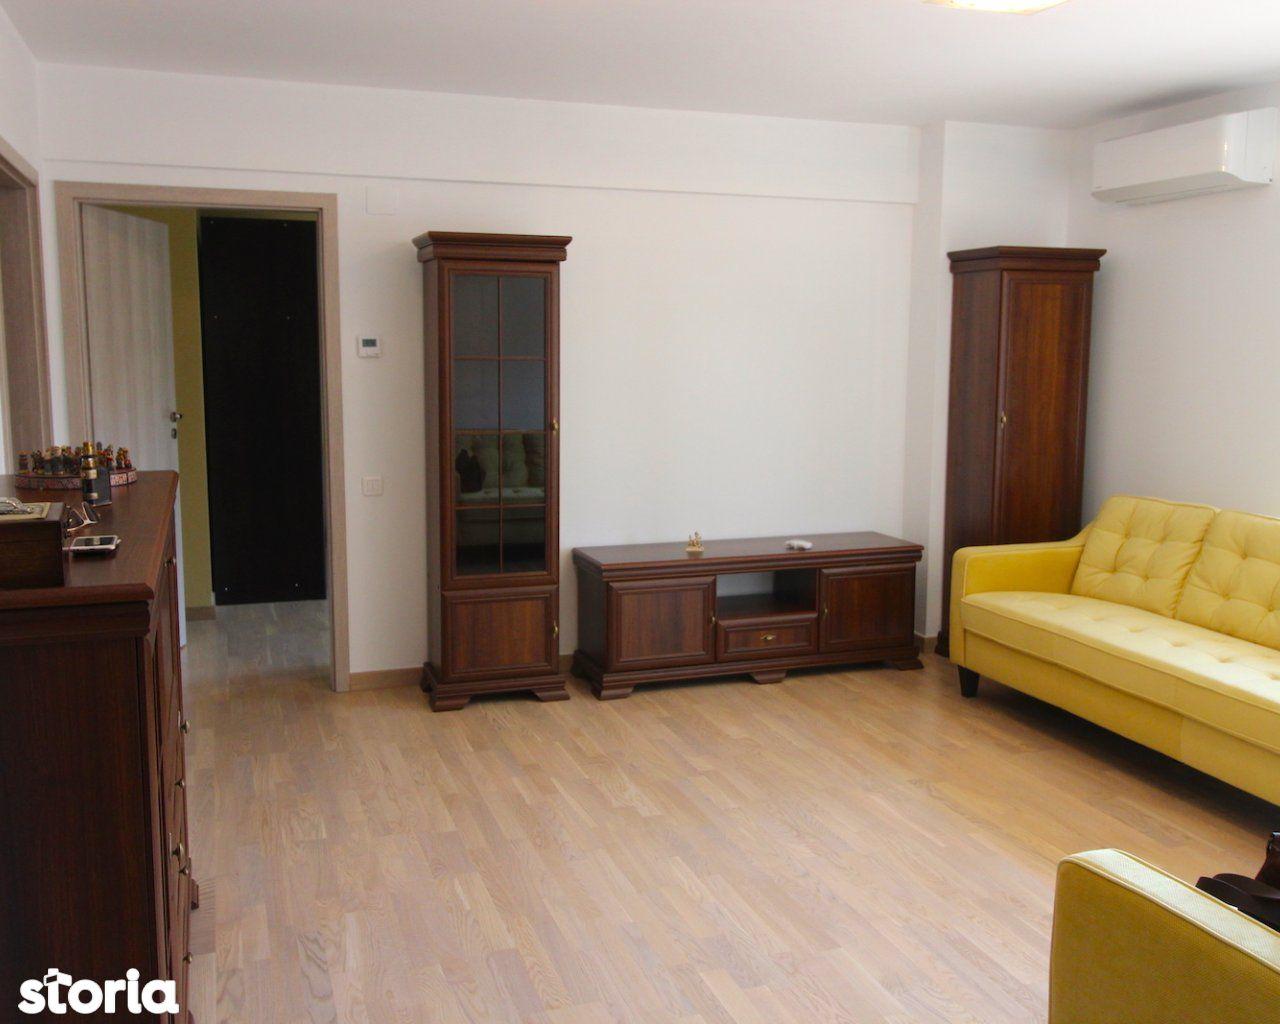 Apartament de inchiriat, București (judet), Bulevardul Banu Manta - Foto 3